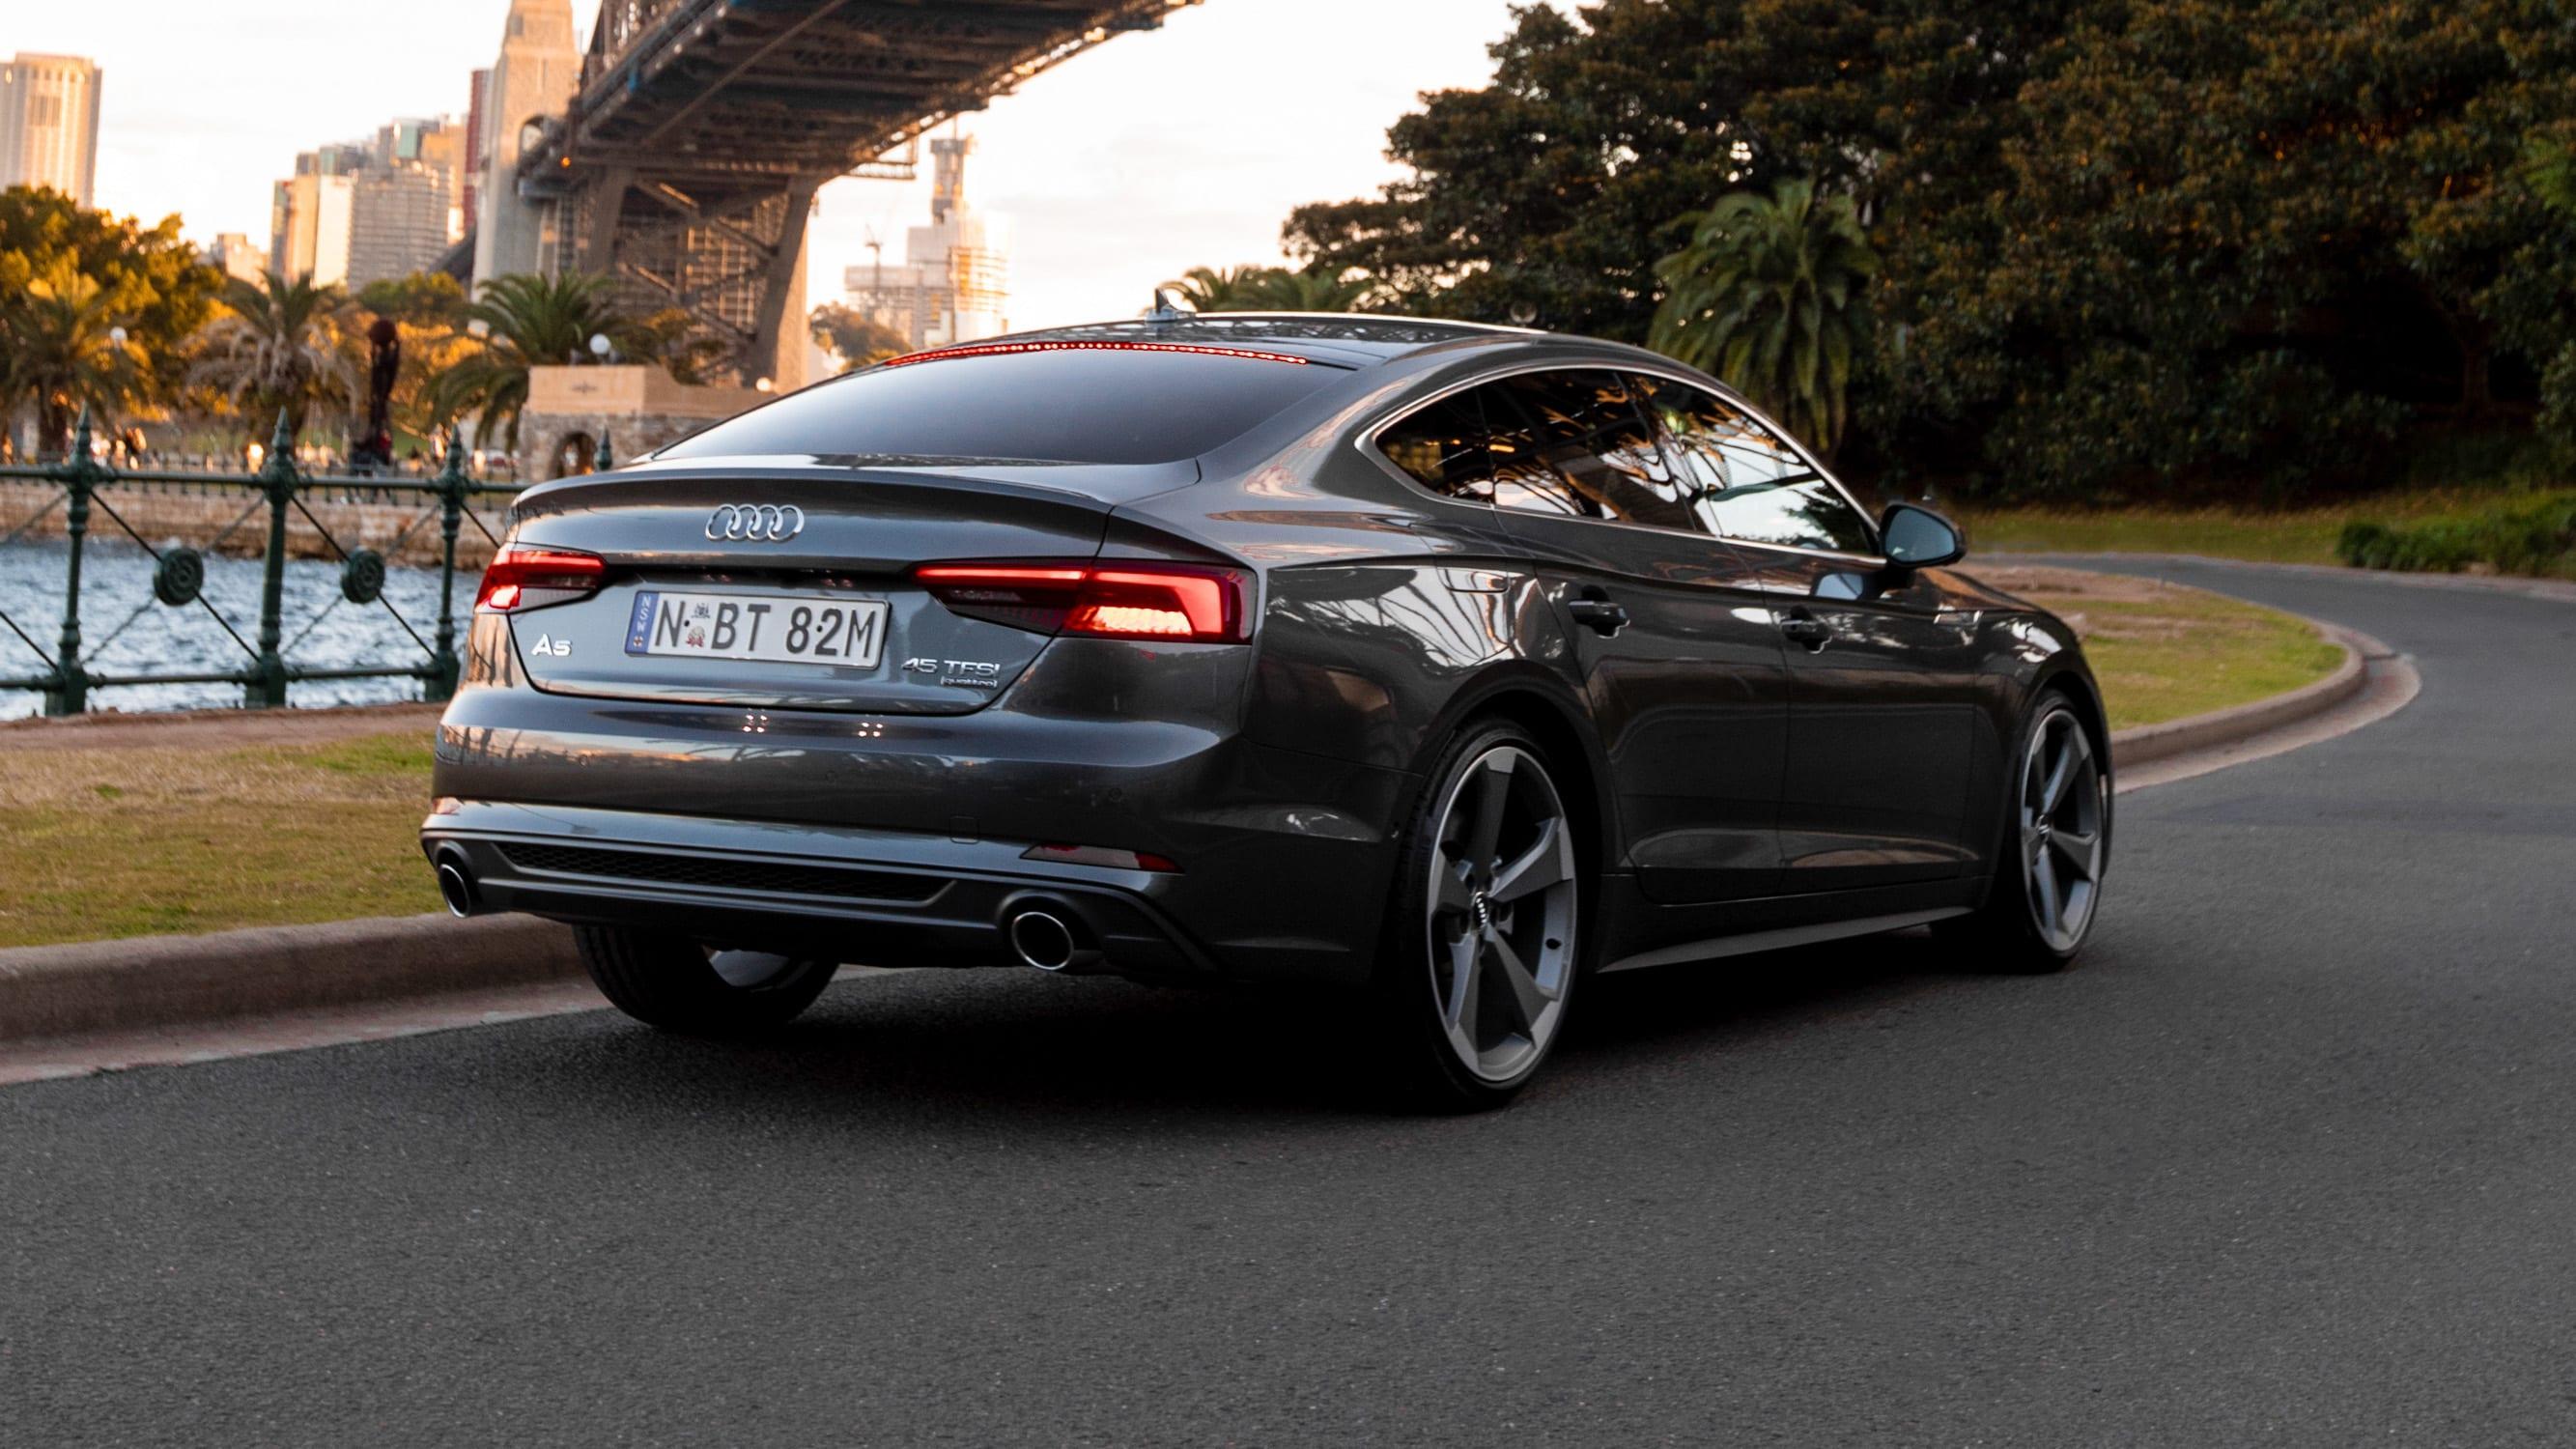 Kekurangan Audi A5 Sportback 2019 Tangguh